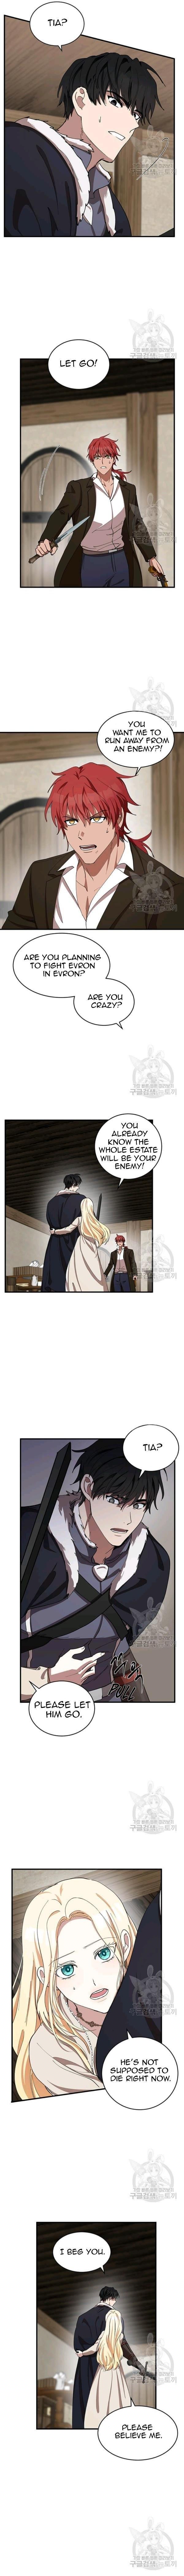 The Villainess Lives Twice Chapter 71 page 6 - Mangakakalots.com